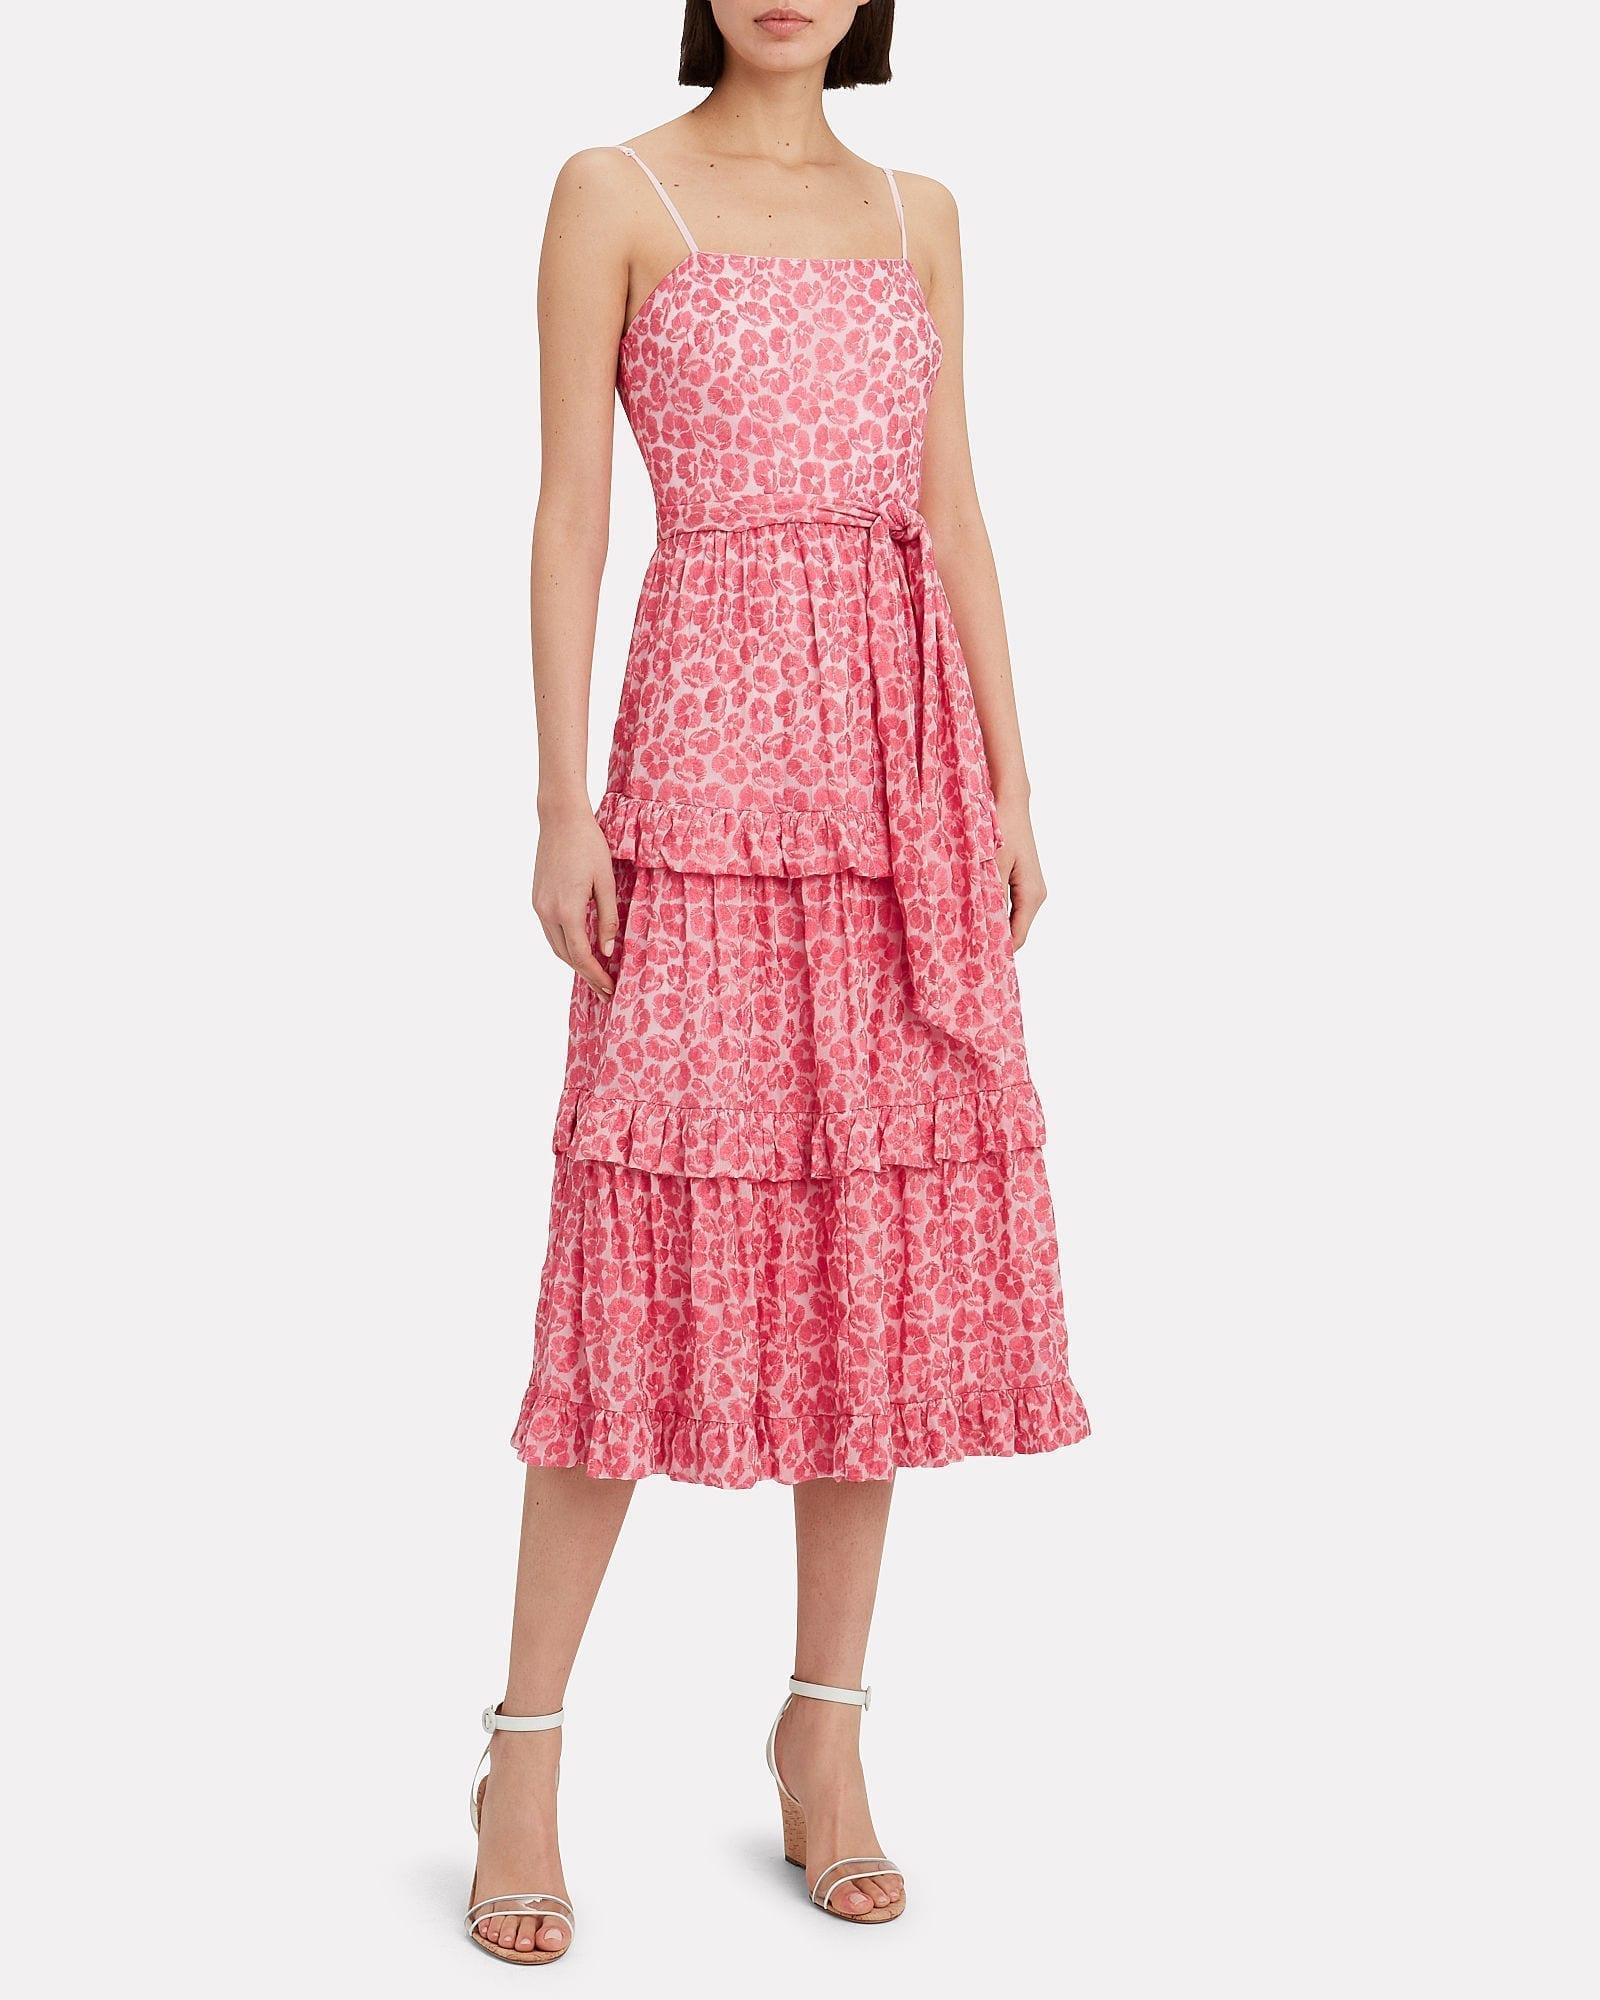 LA MAISON TALULAH Blossom Flounce Midi Dress